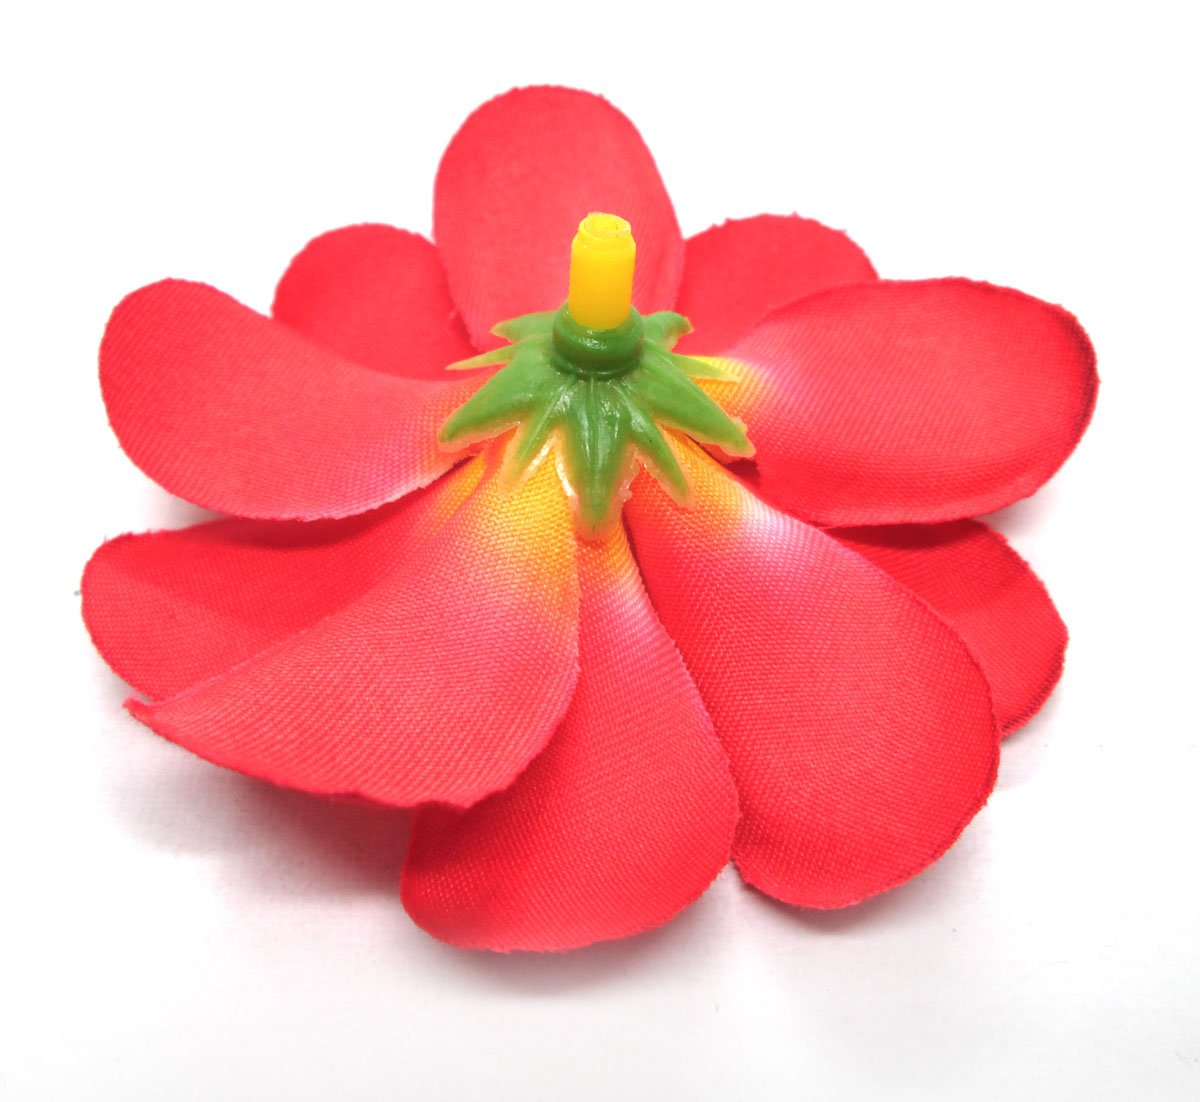 Make Silk Wedding Flowers: (100) Red Hawaiian Plumeria Frangipani Silk Flower Heads